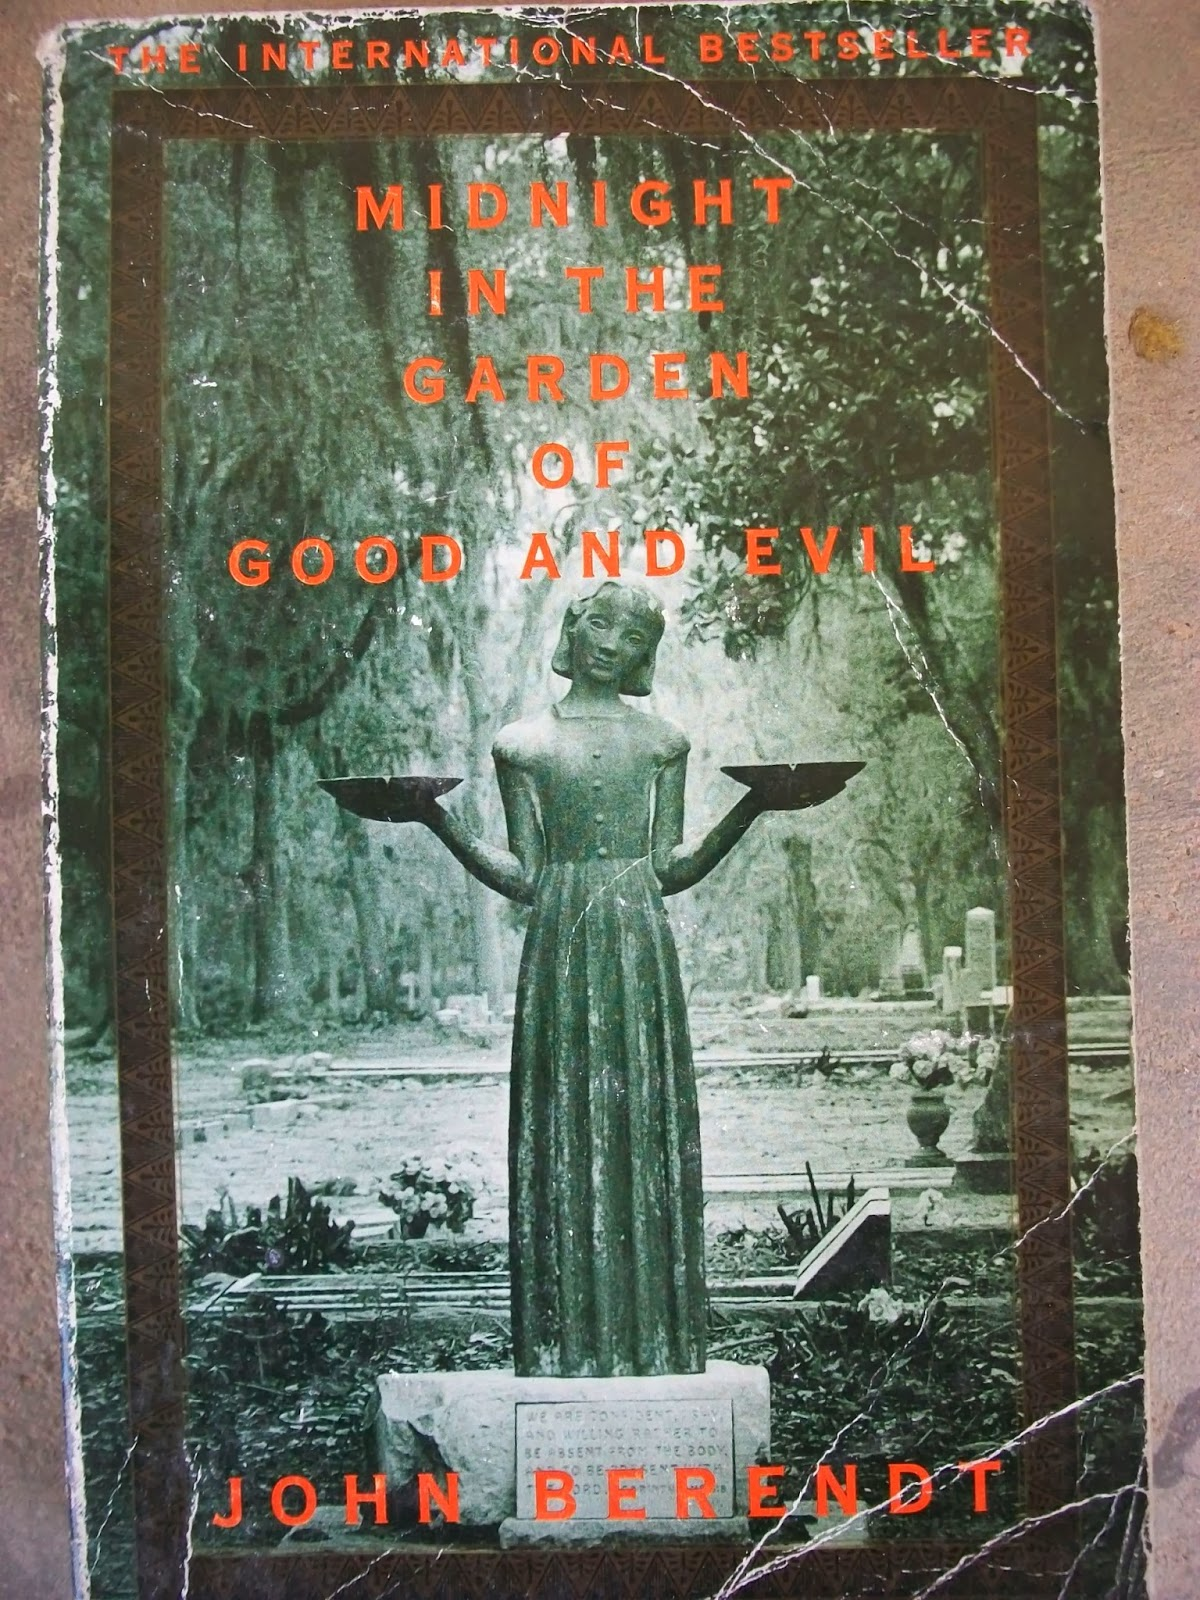 Vinod ekbote november 2013 - Midnight in the garden of good and evil book ...